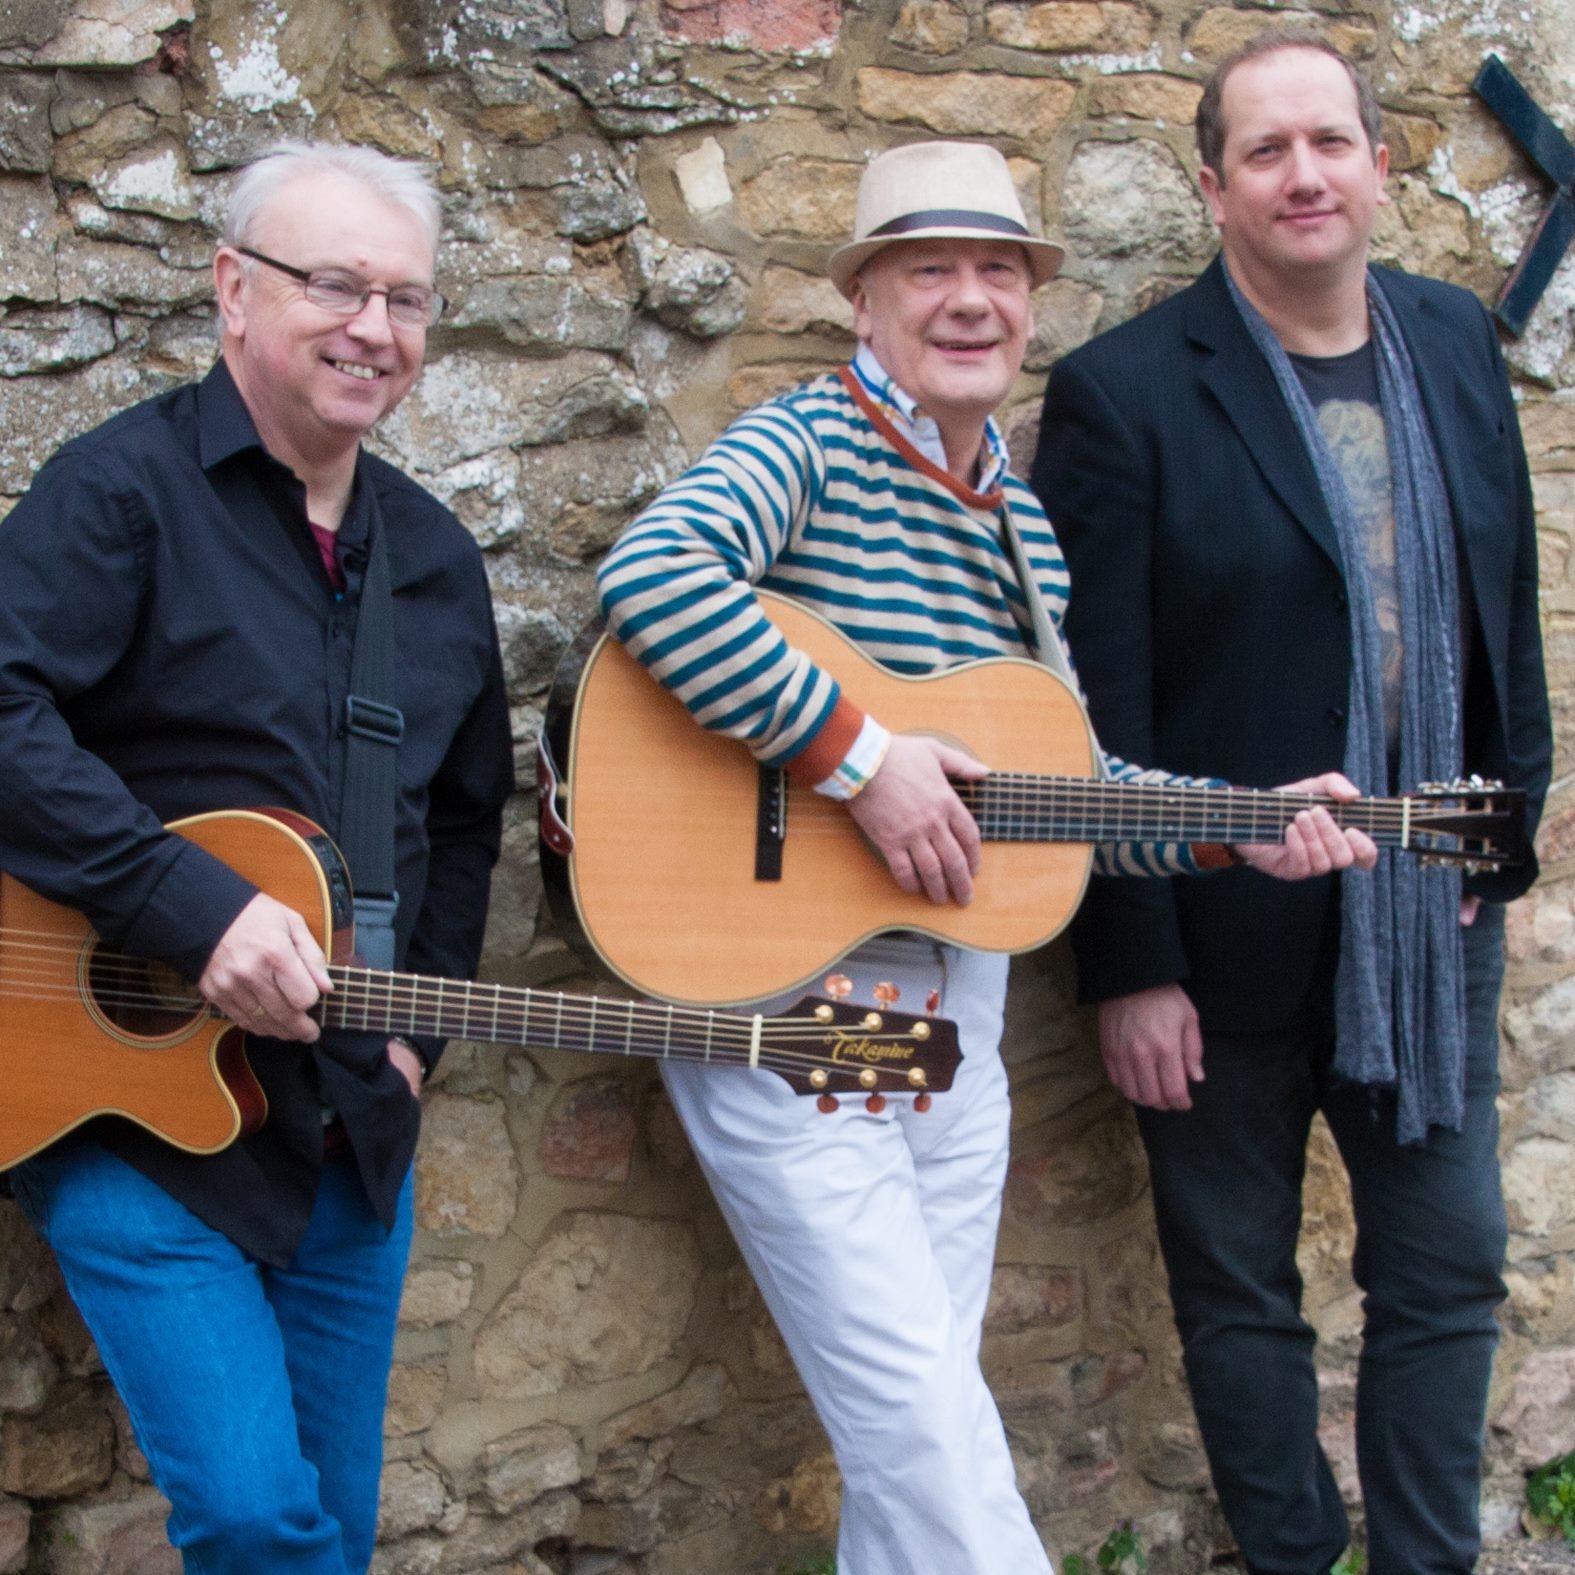 Roddy Clenaghan Band